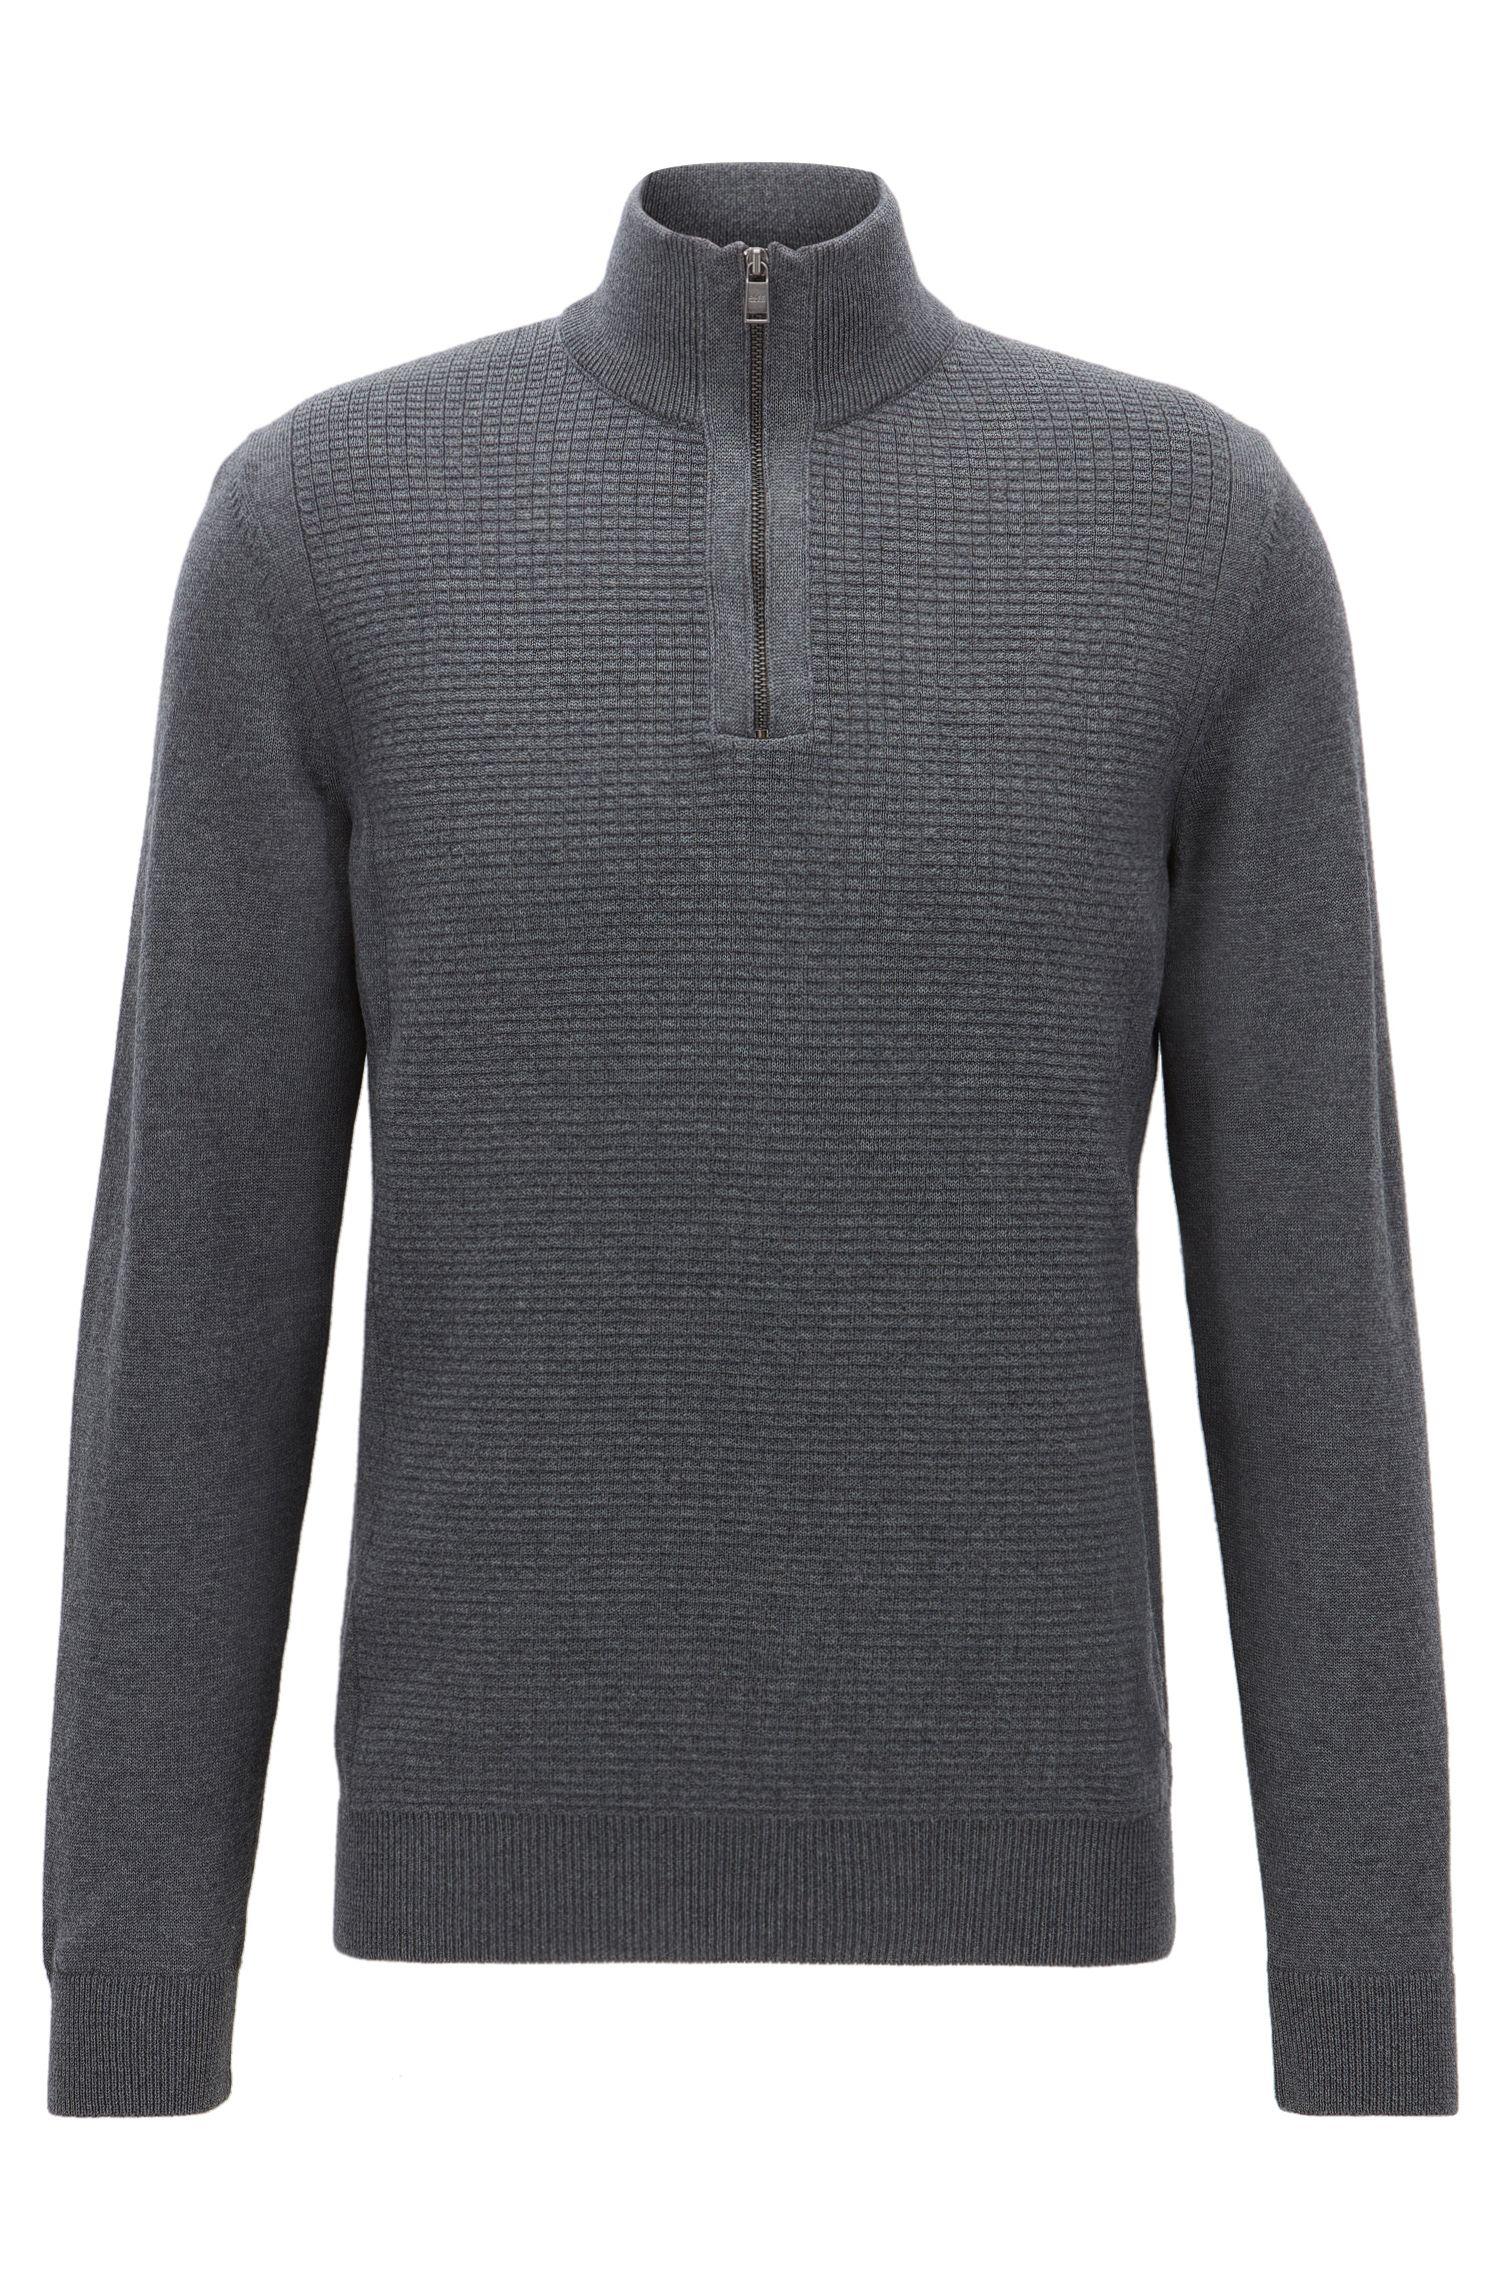 Waffle-Knit Virgin Wool Sweater | Nacello, Grey